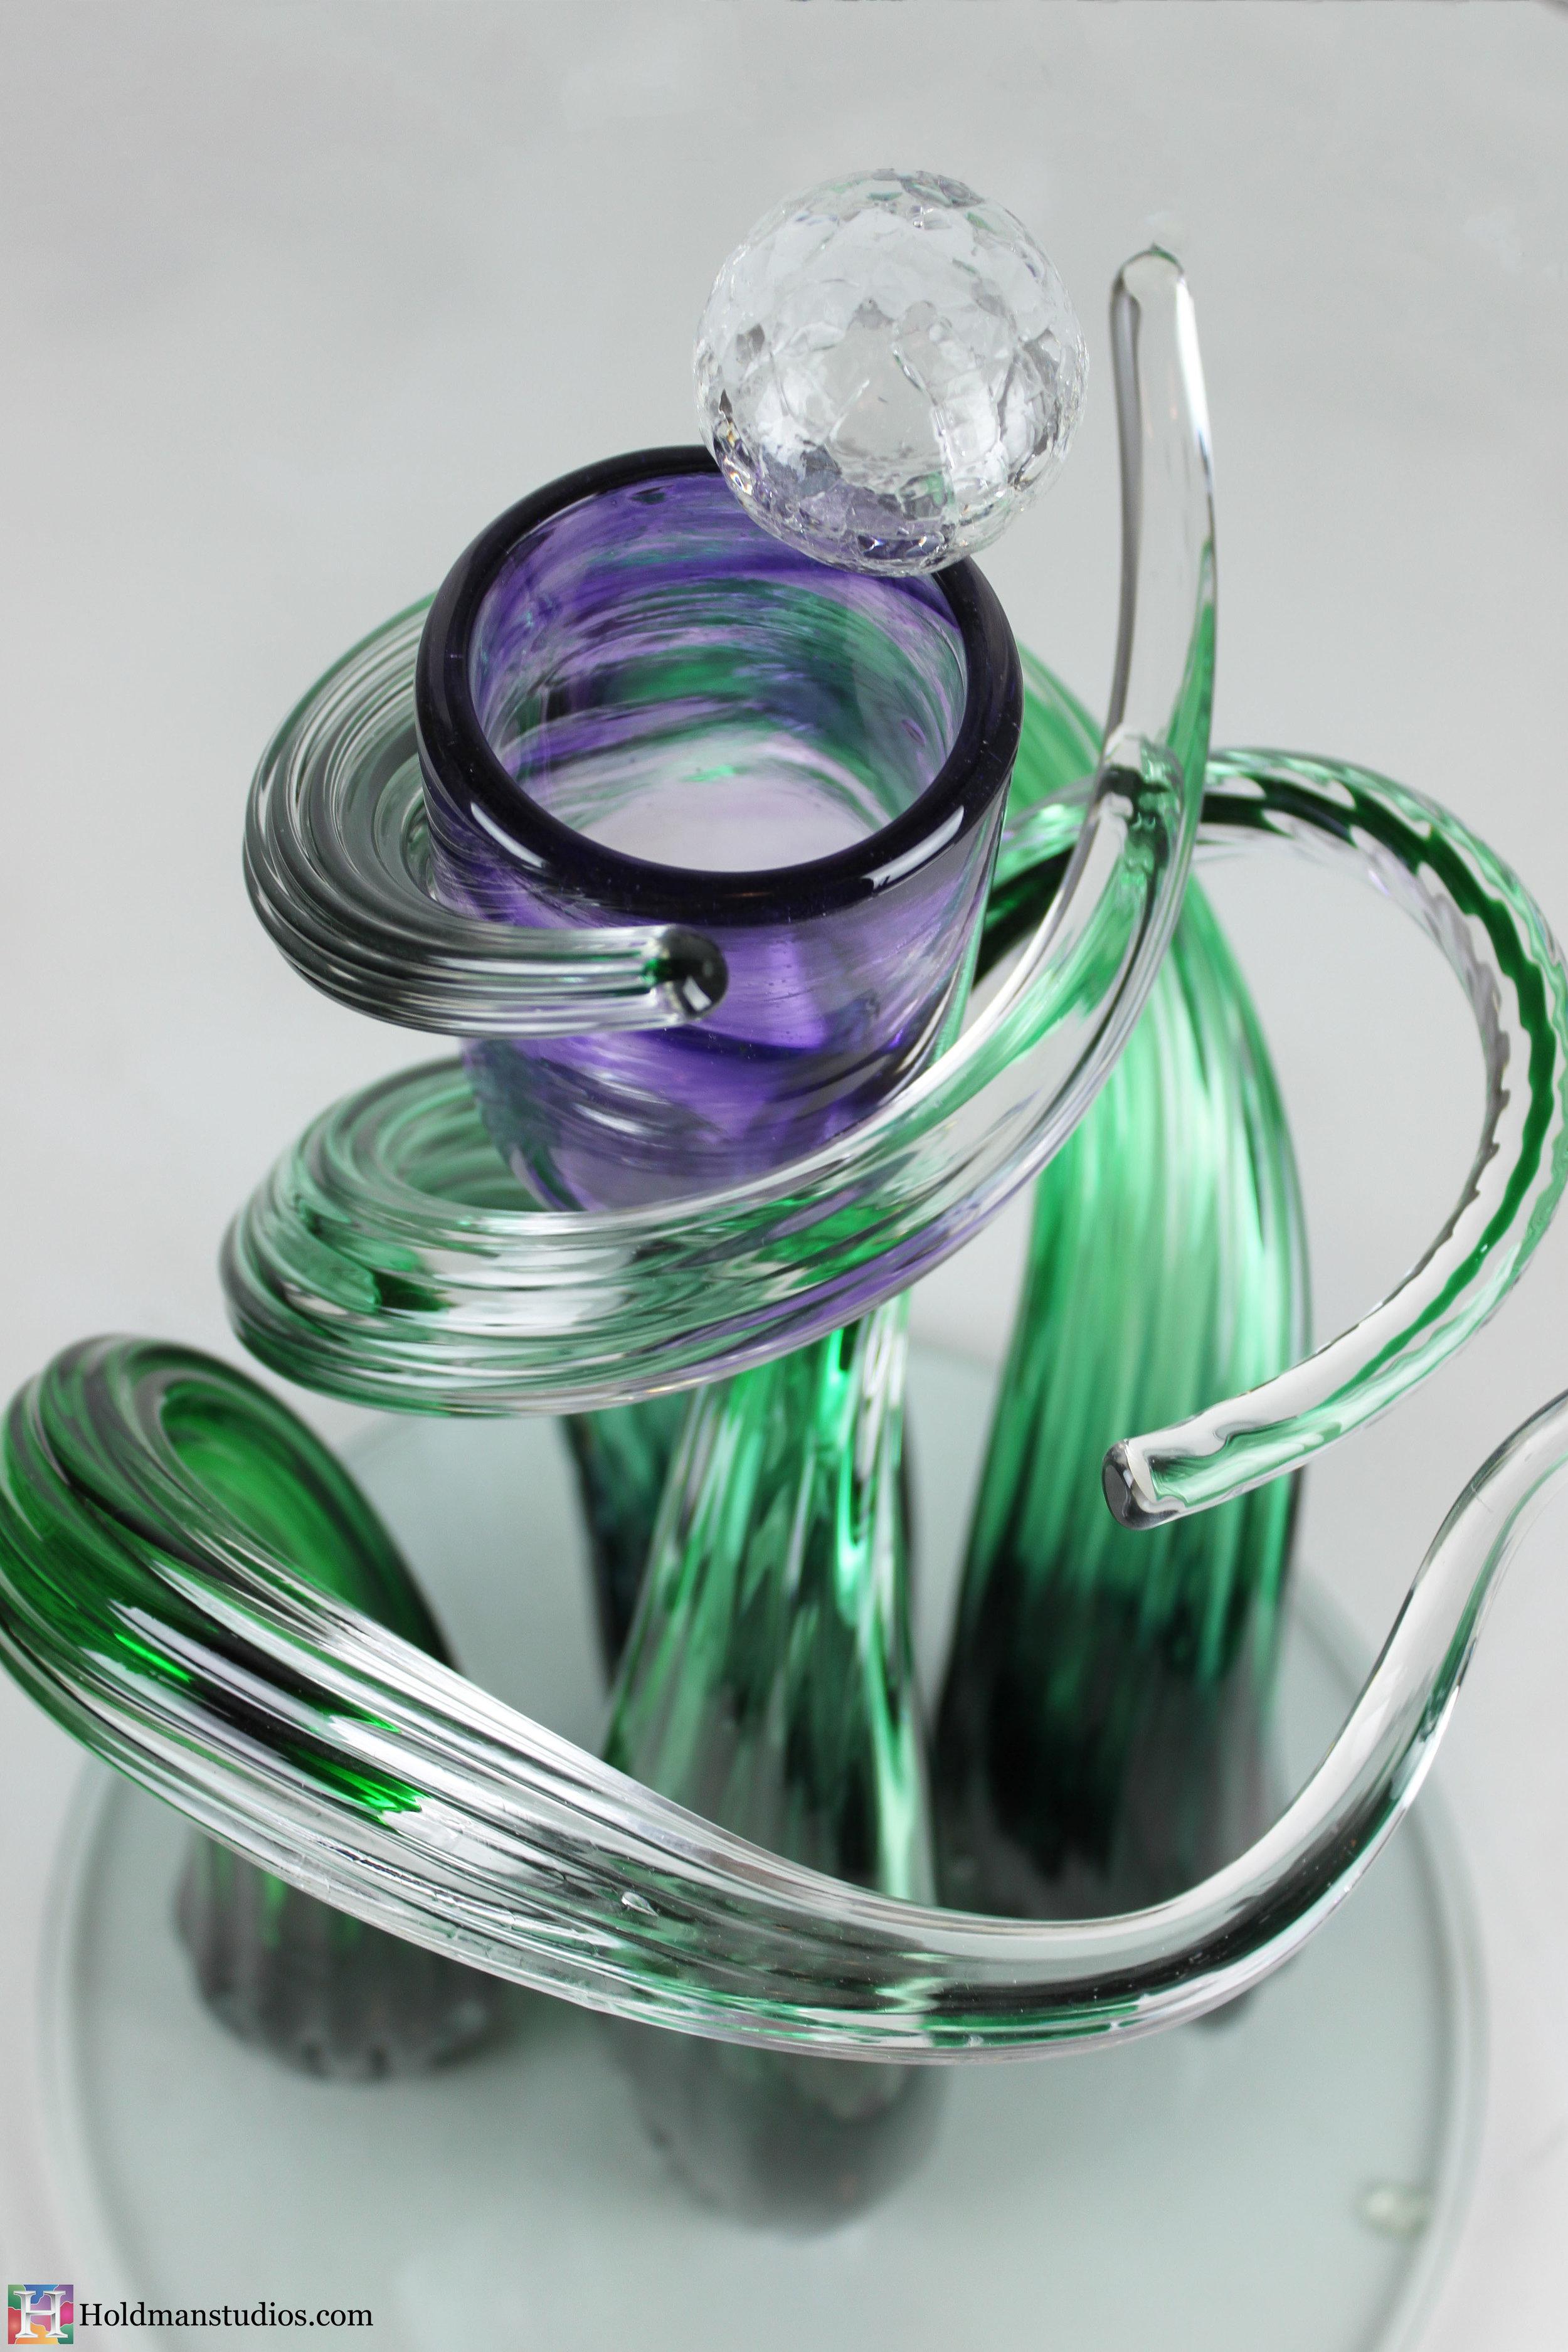 Holdman-studios-hand-blown-glass-sentsy-golf-trolfy-award3.jpg